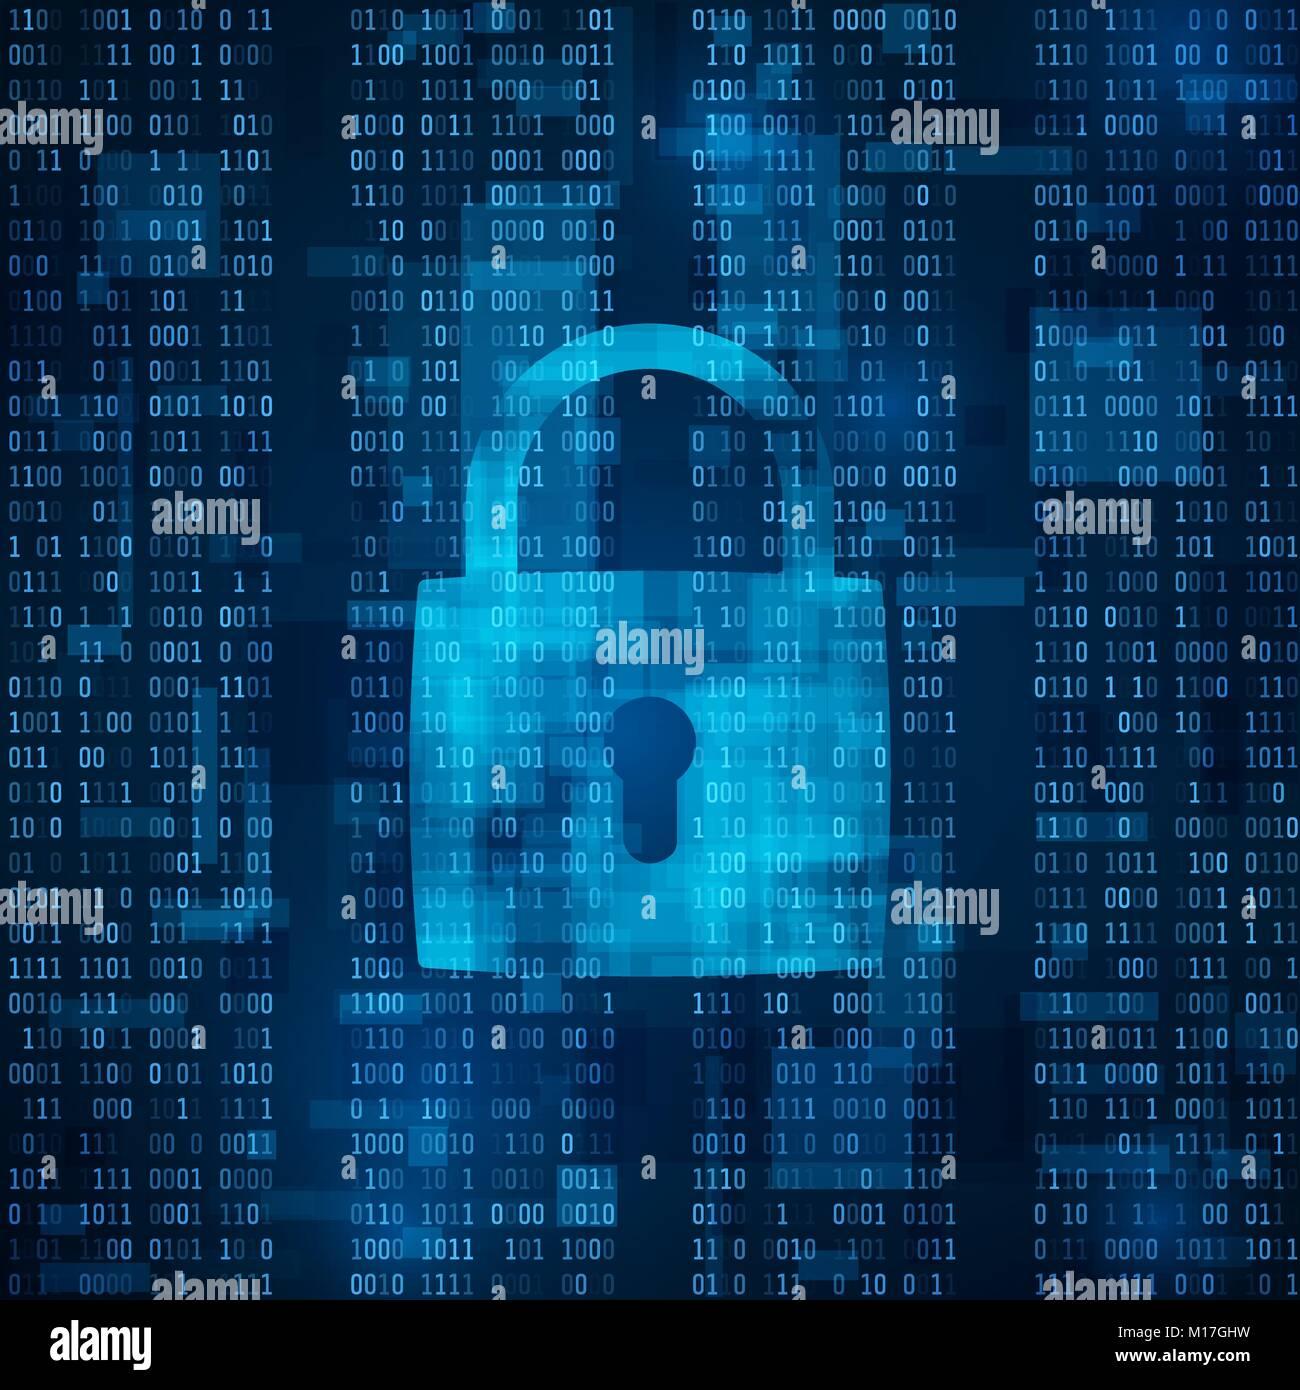 Bloqueo de ataques de piratas informáticos. protección de datos hacking. software antivirus. seguridad Imagen De Stock